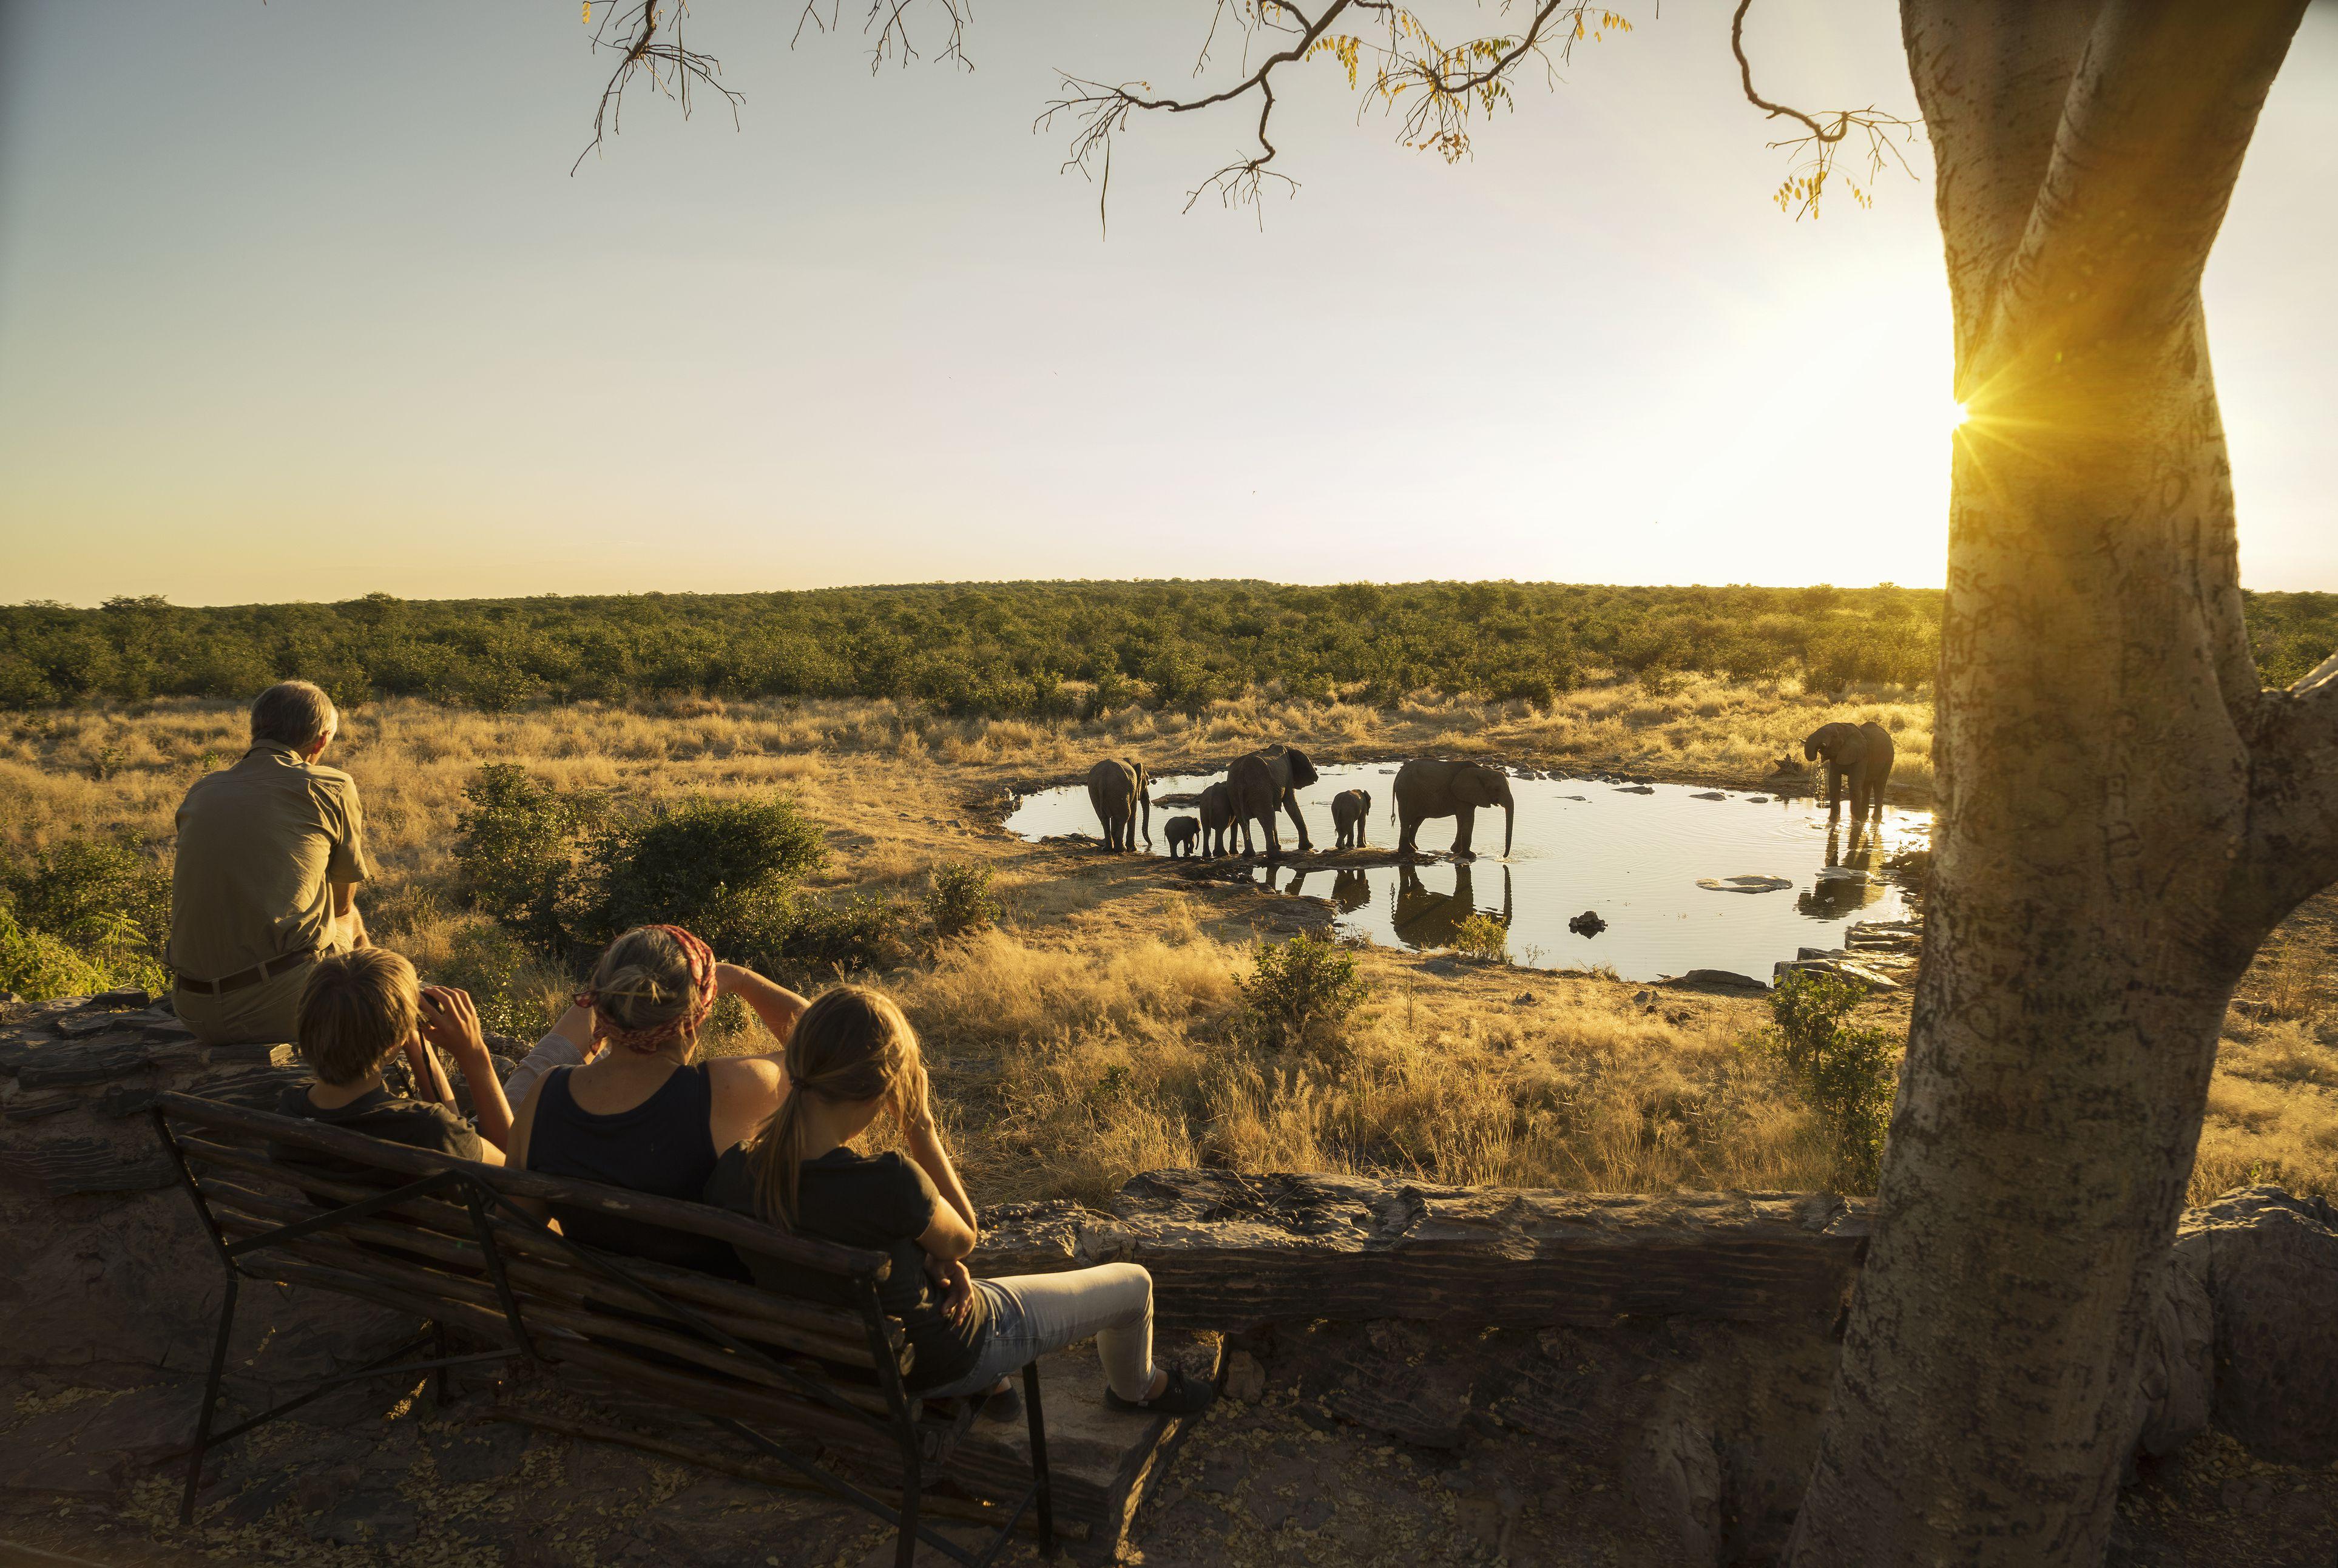 Top 10 Unmissable African Safari Destinations